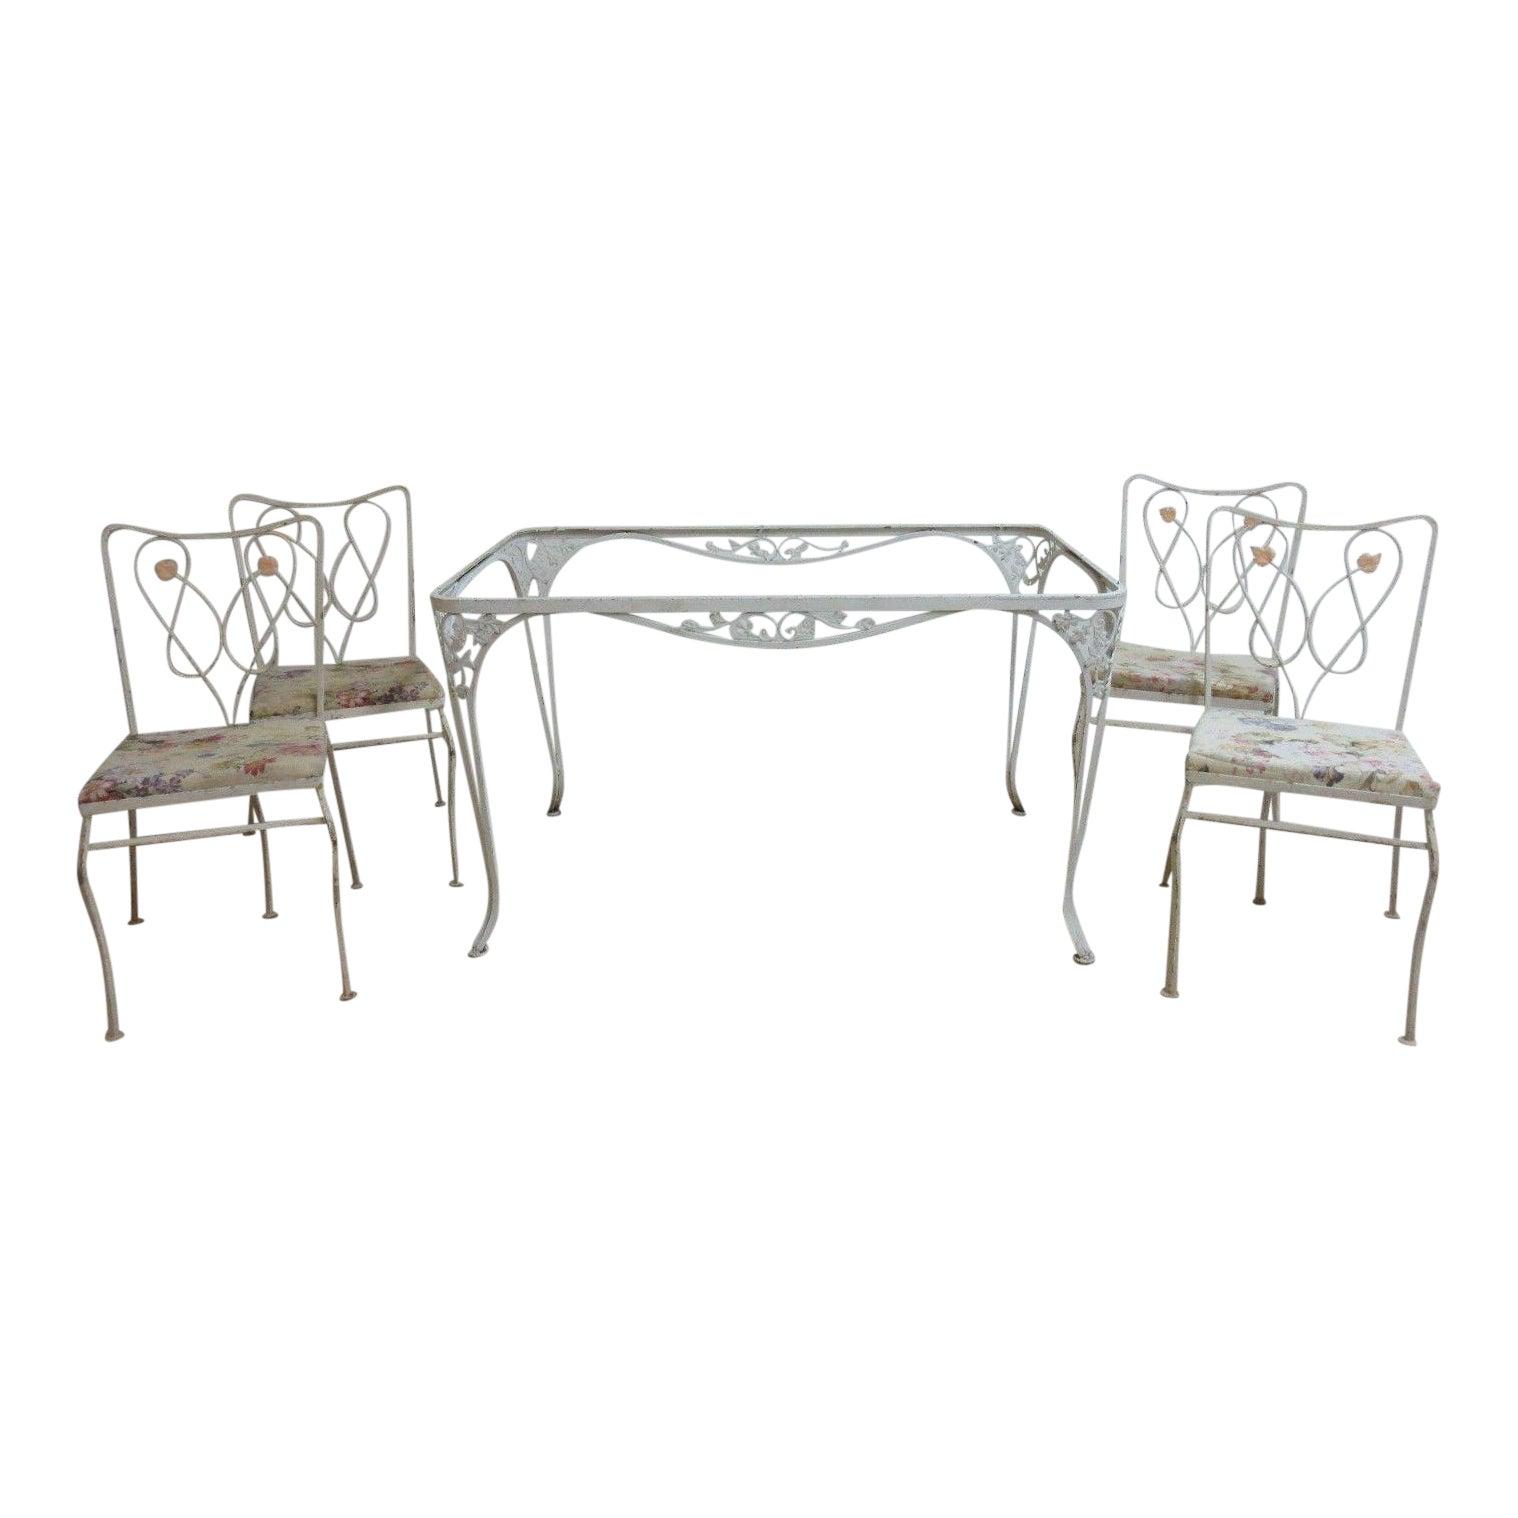 Vintage Woodard Outdoor Patio Metal Dining Set Chairish